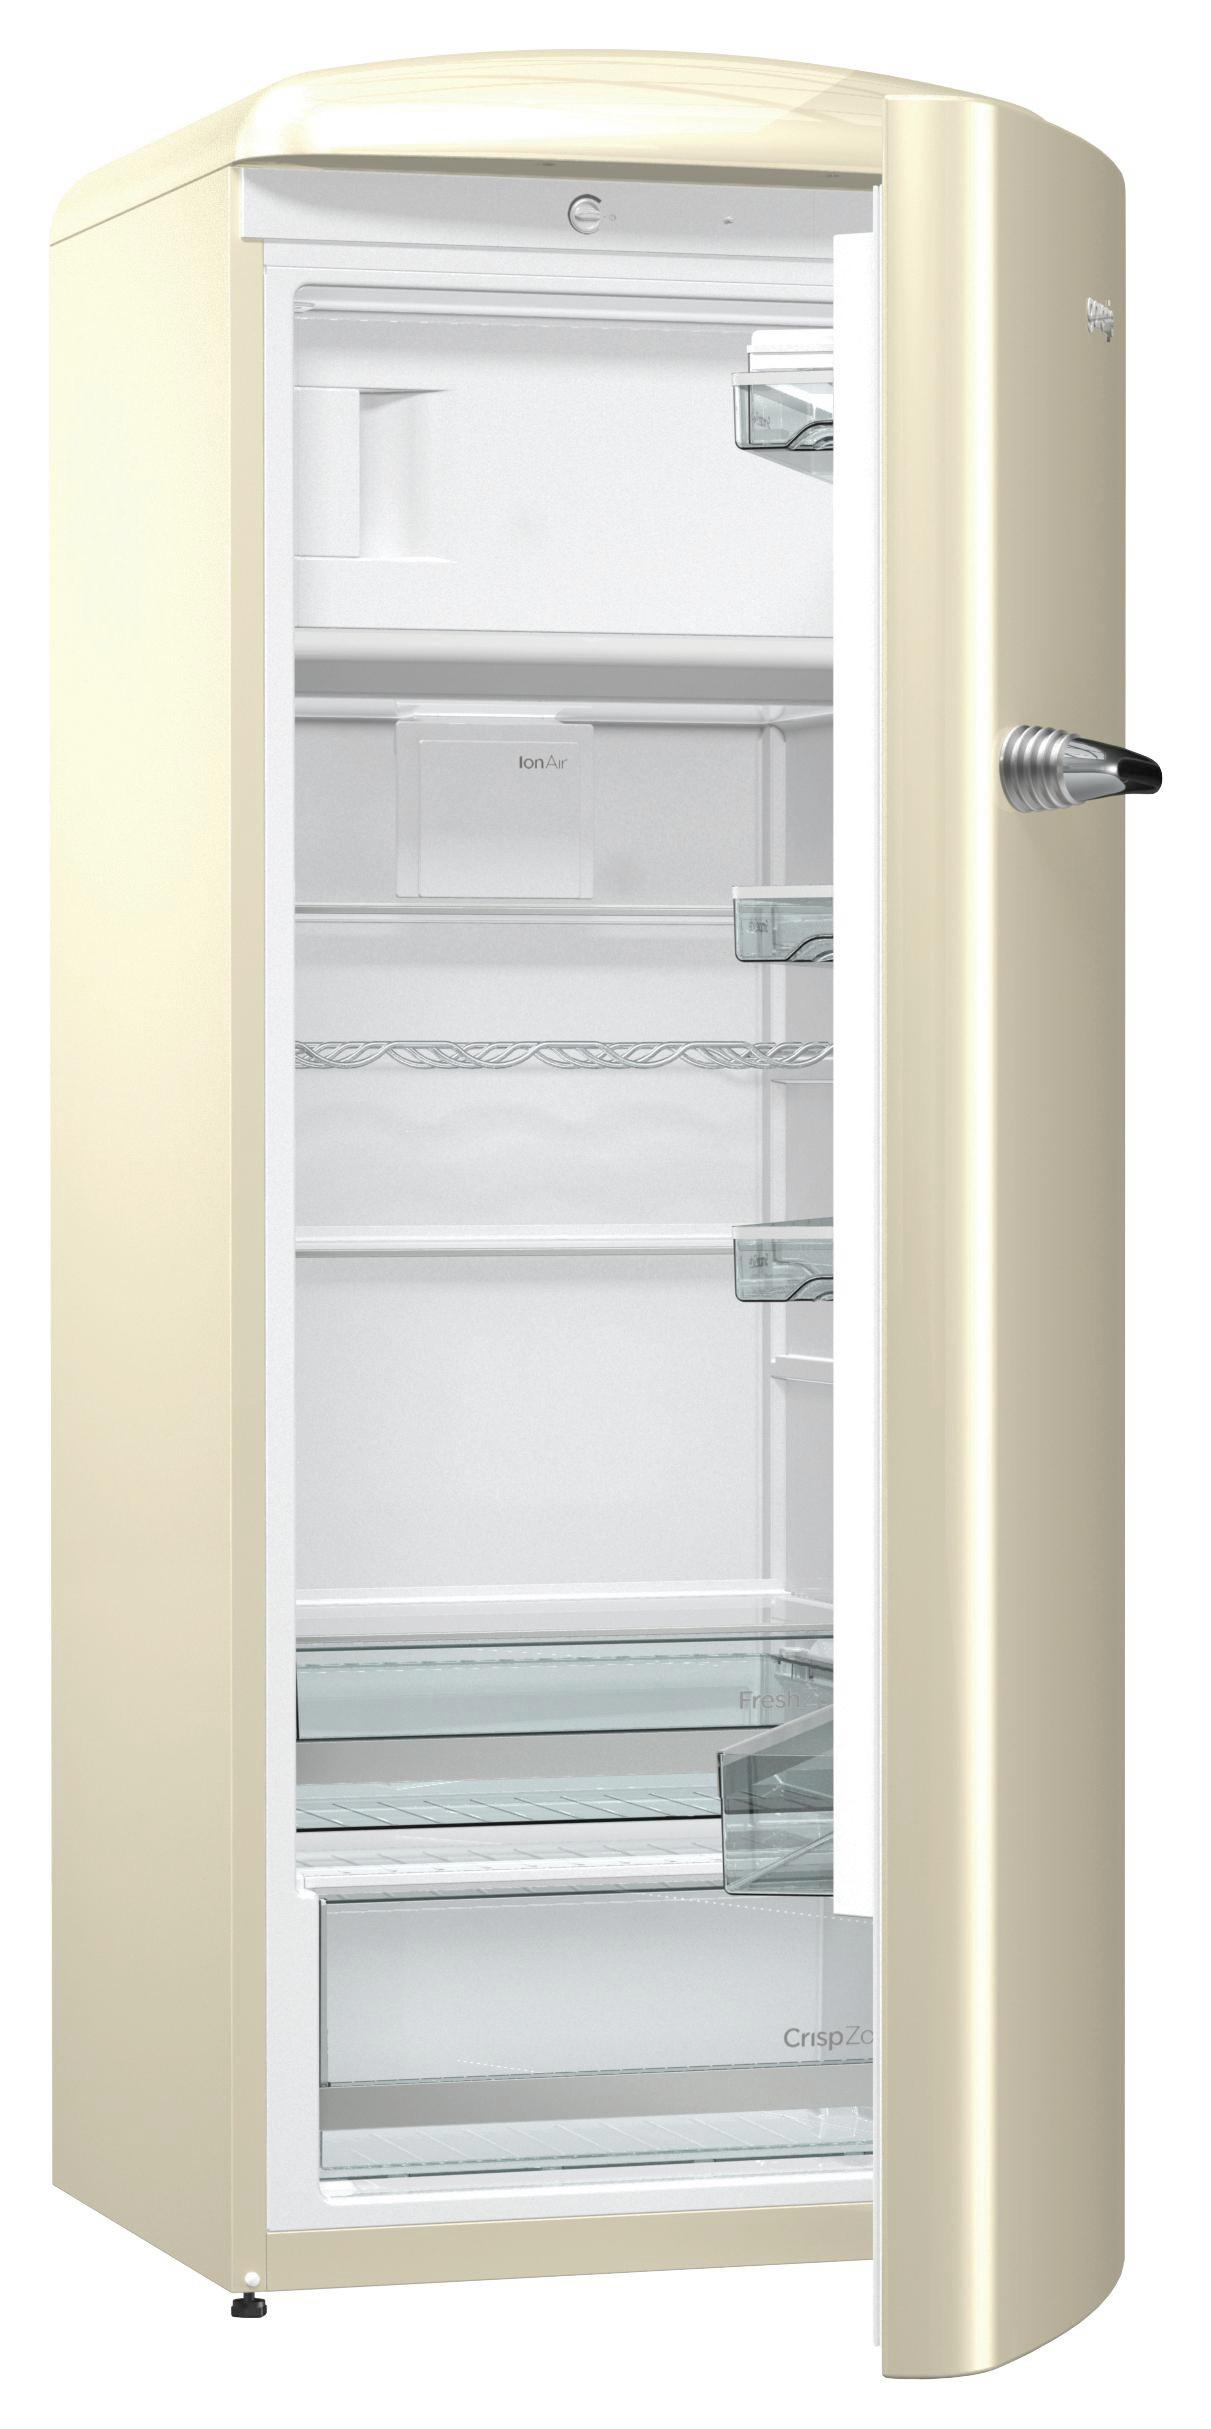 Kühlschrank Gorenje : Gorenje kühlschrank orb c online kaufen ➤ möbelix